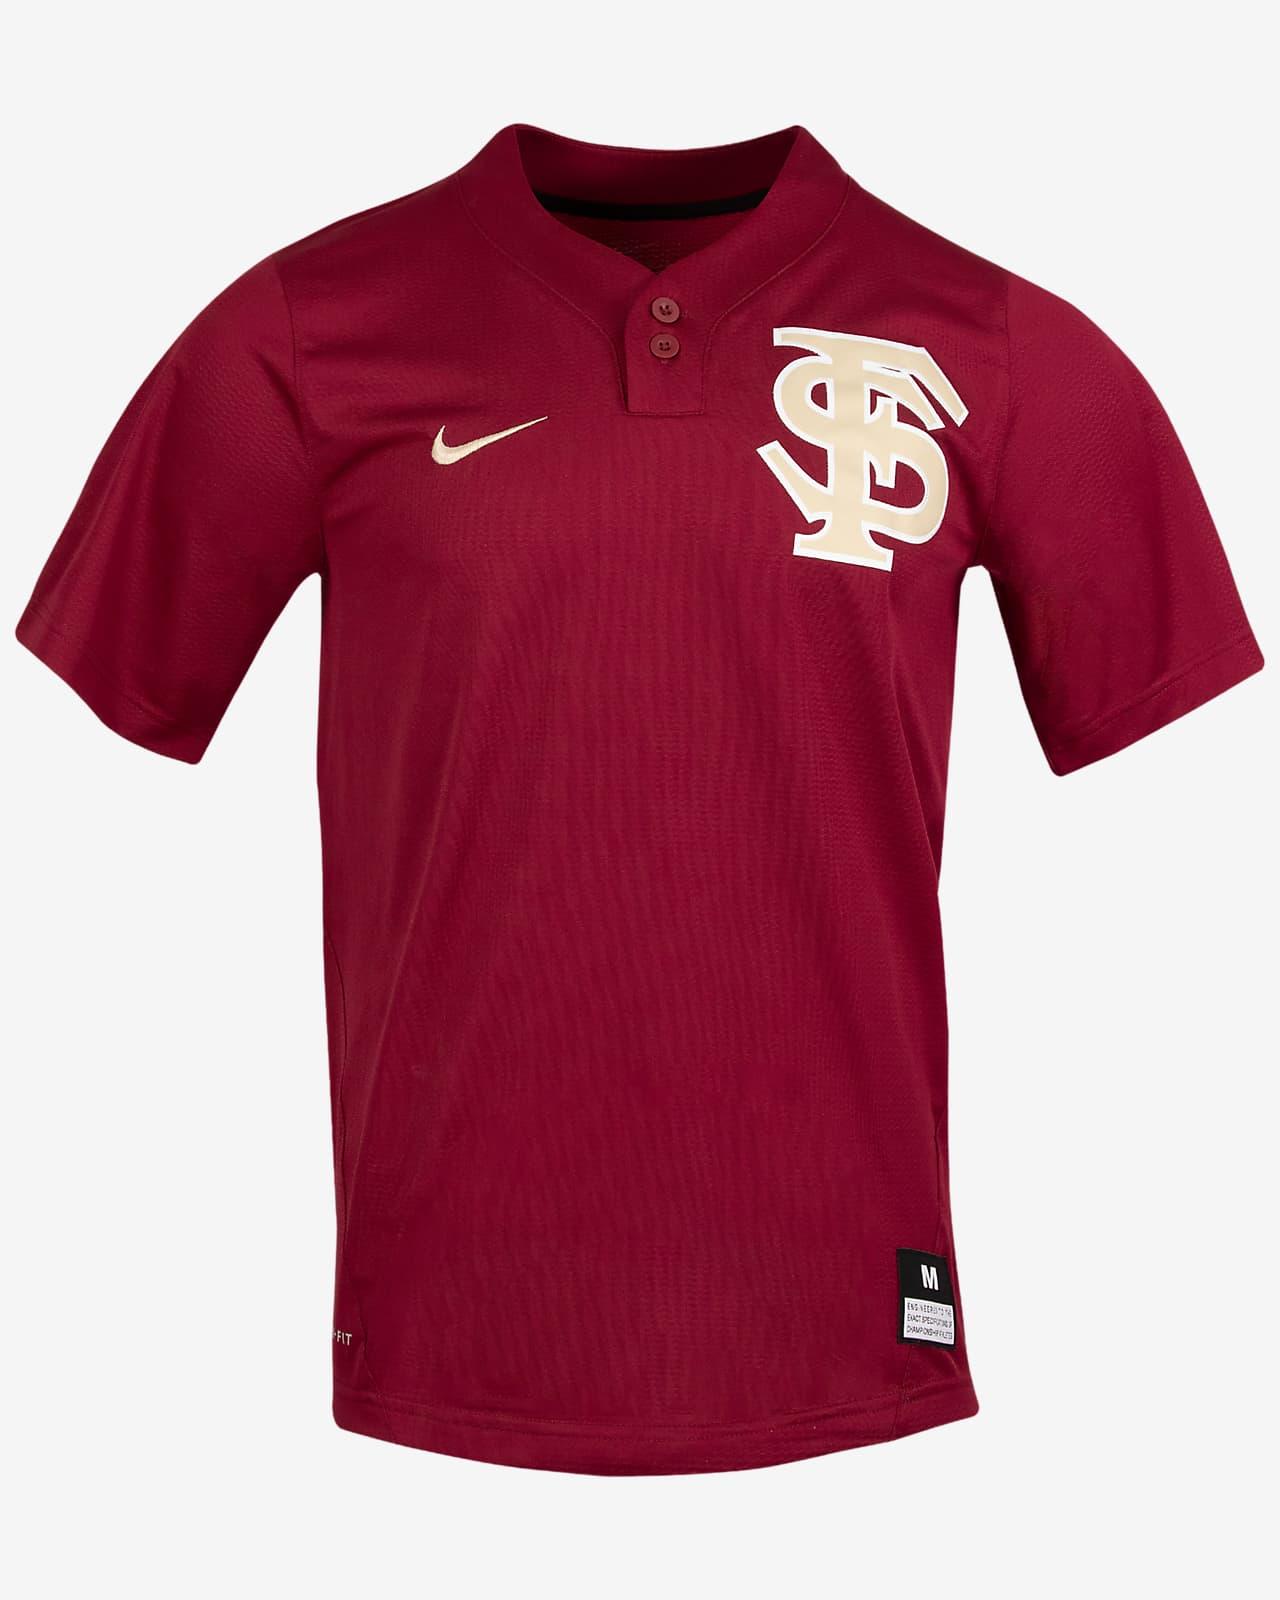 Nike College (Florida State) 2-Button Softball Jersey